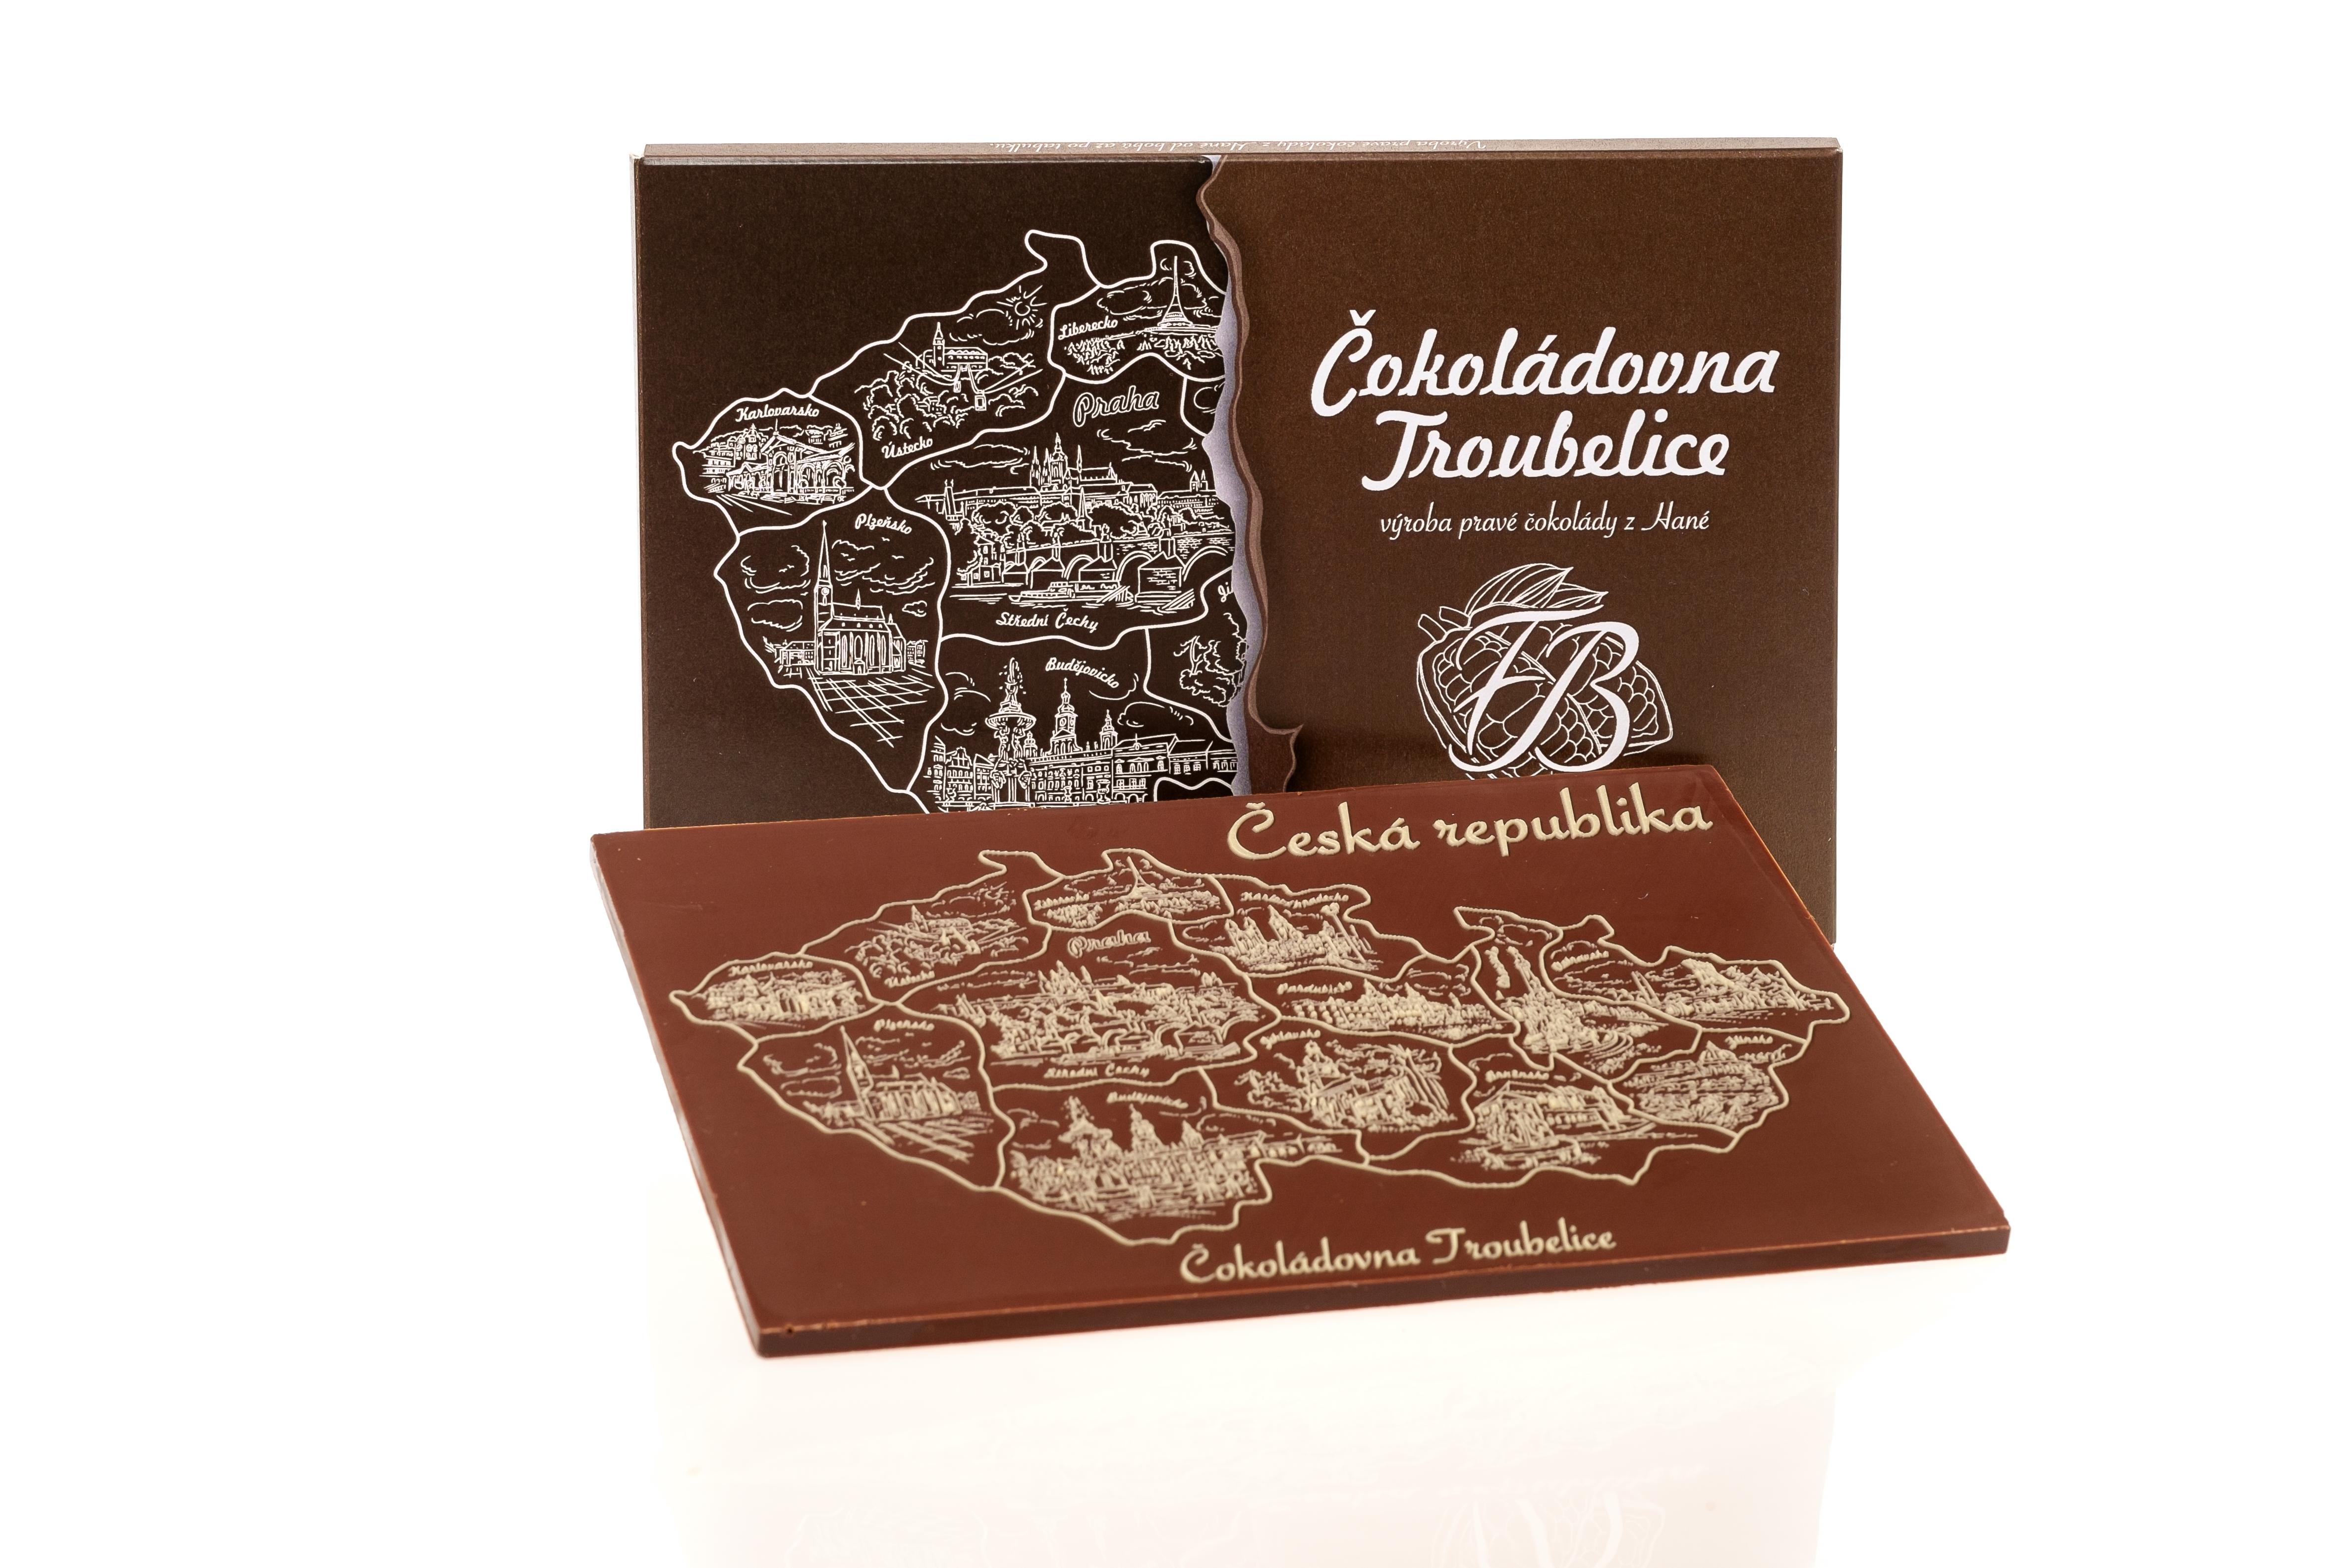 Cokoladovna_troubelice-81